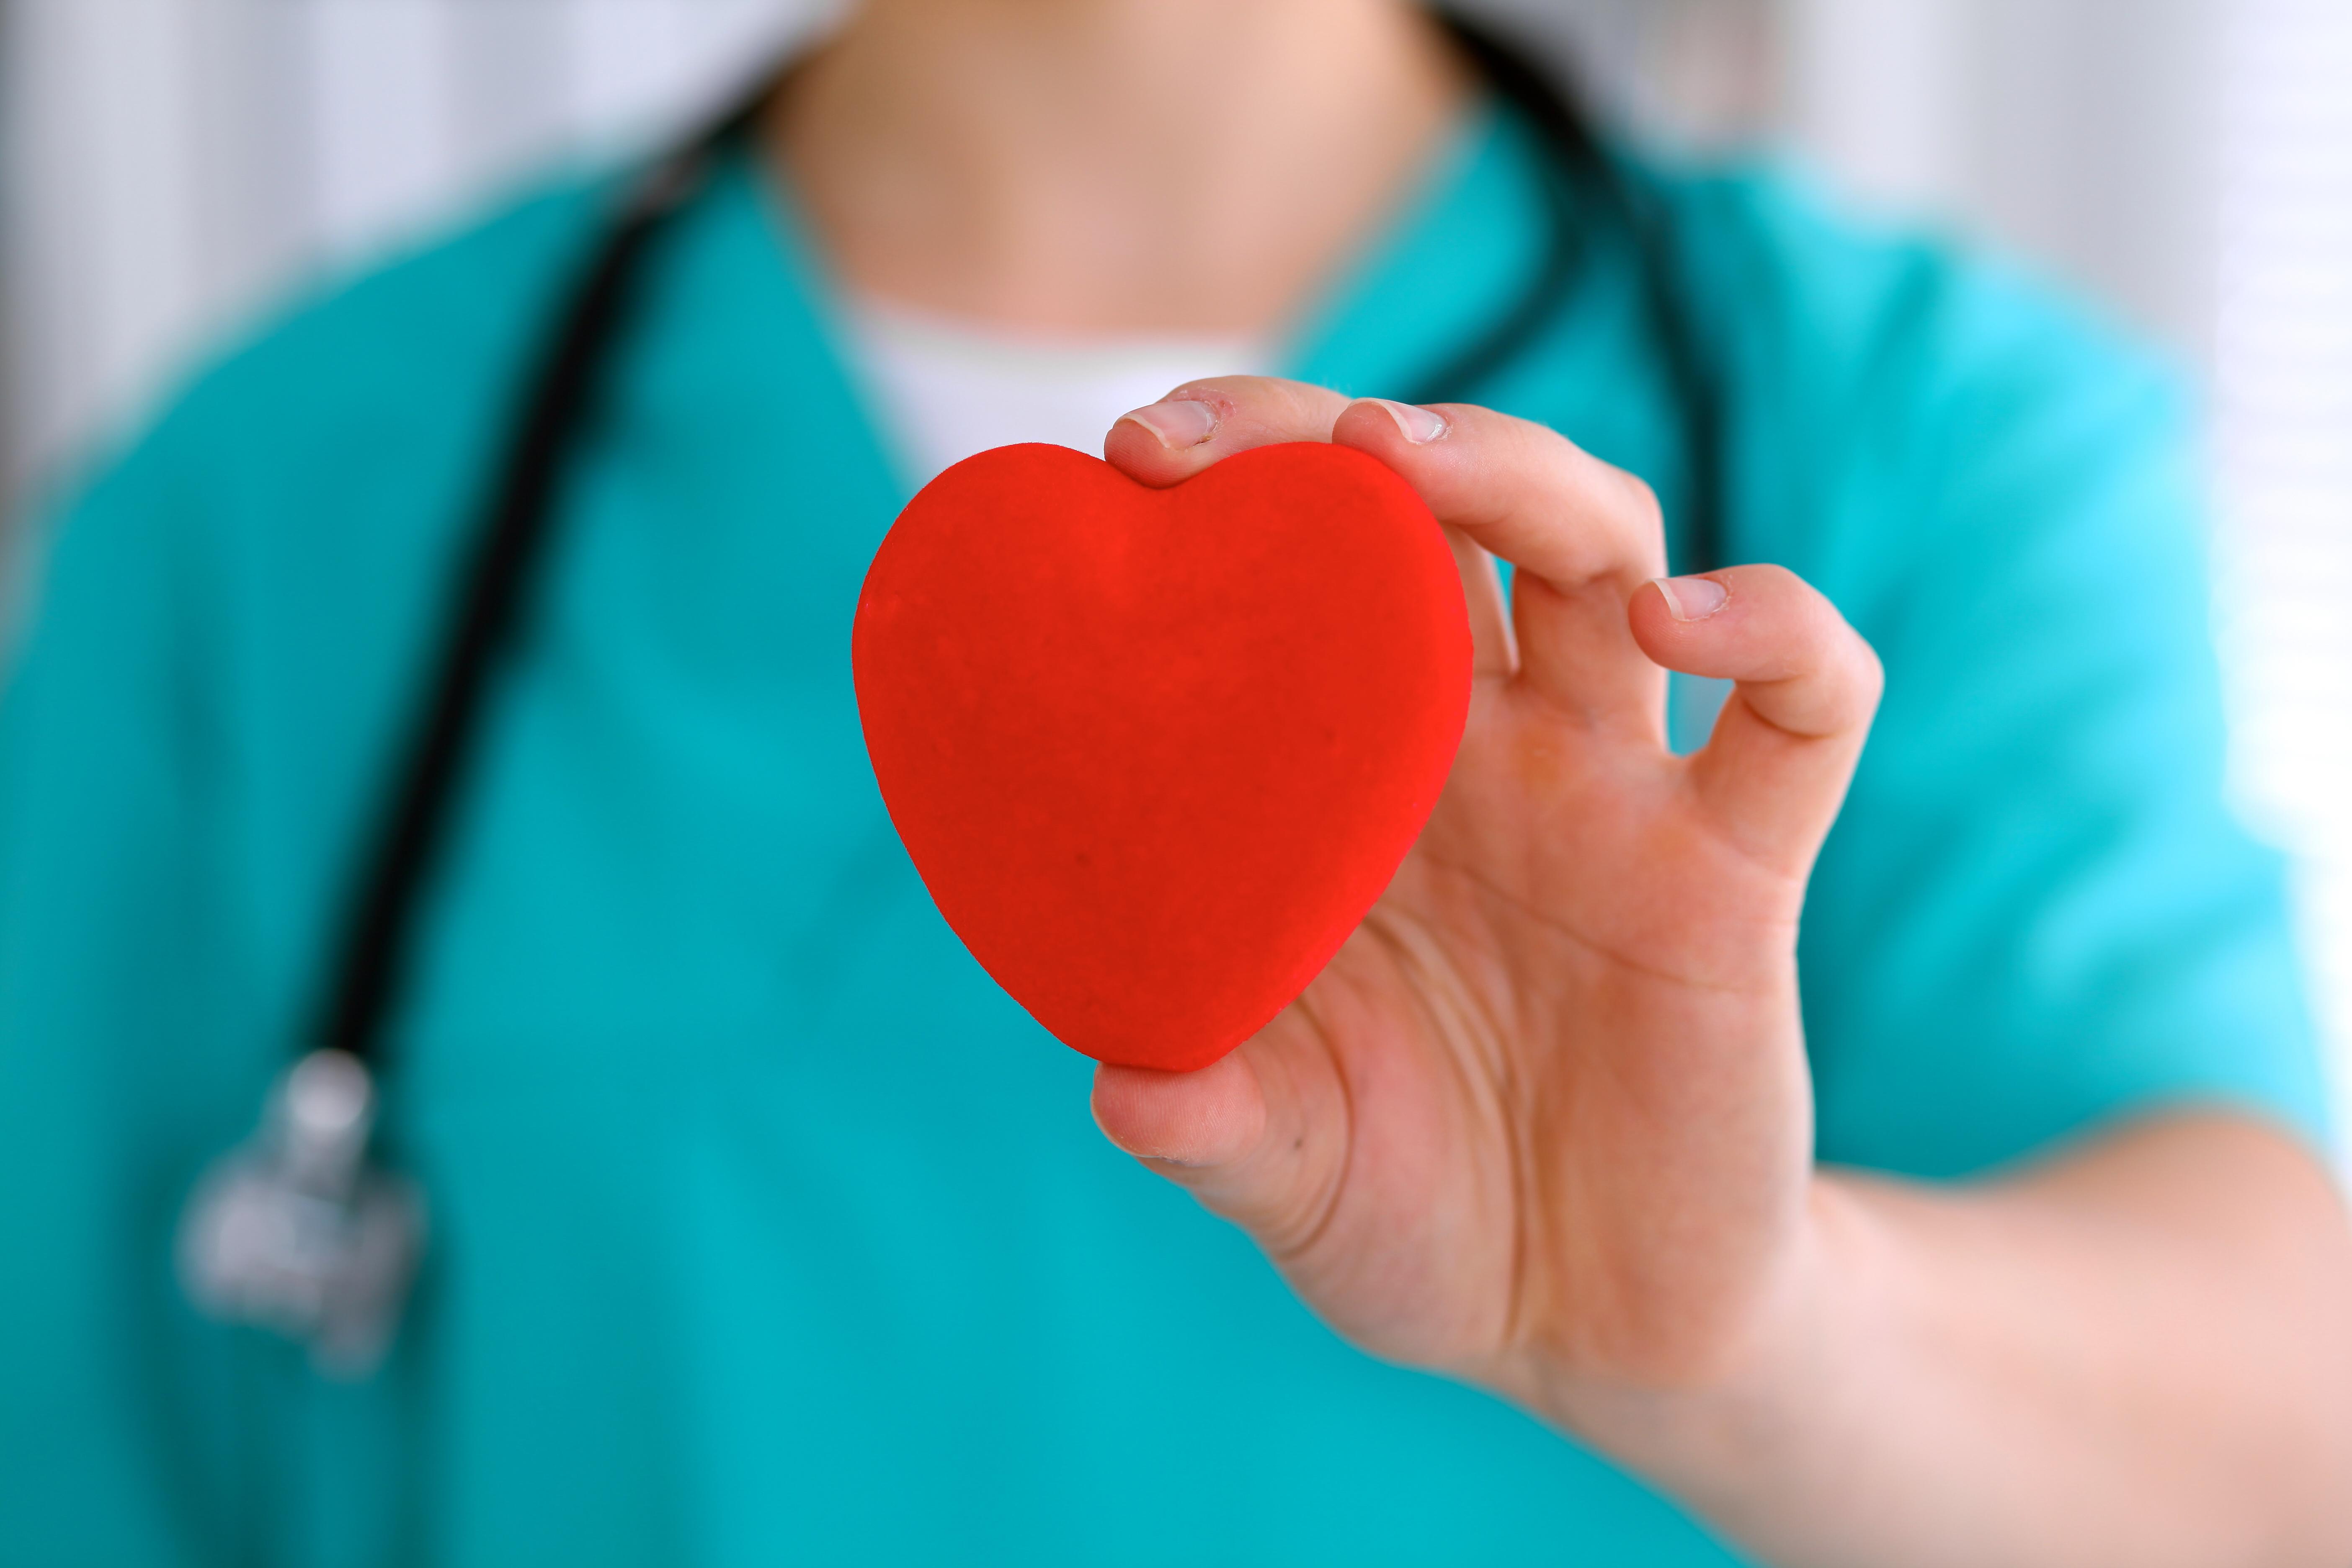 4 ways to a happier, healthier heart